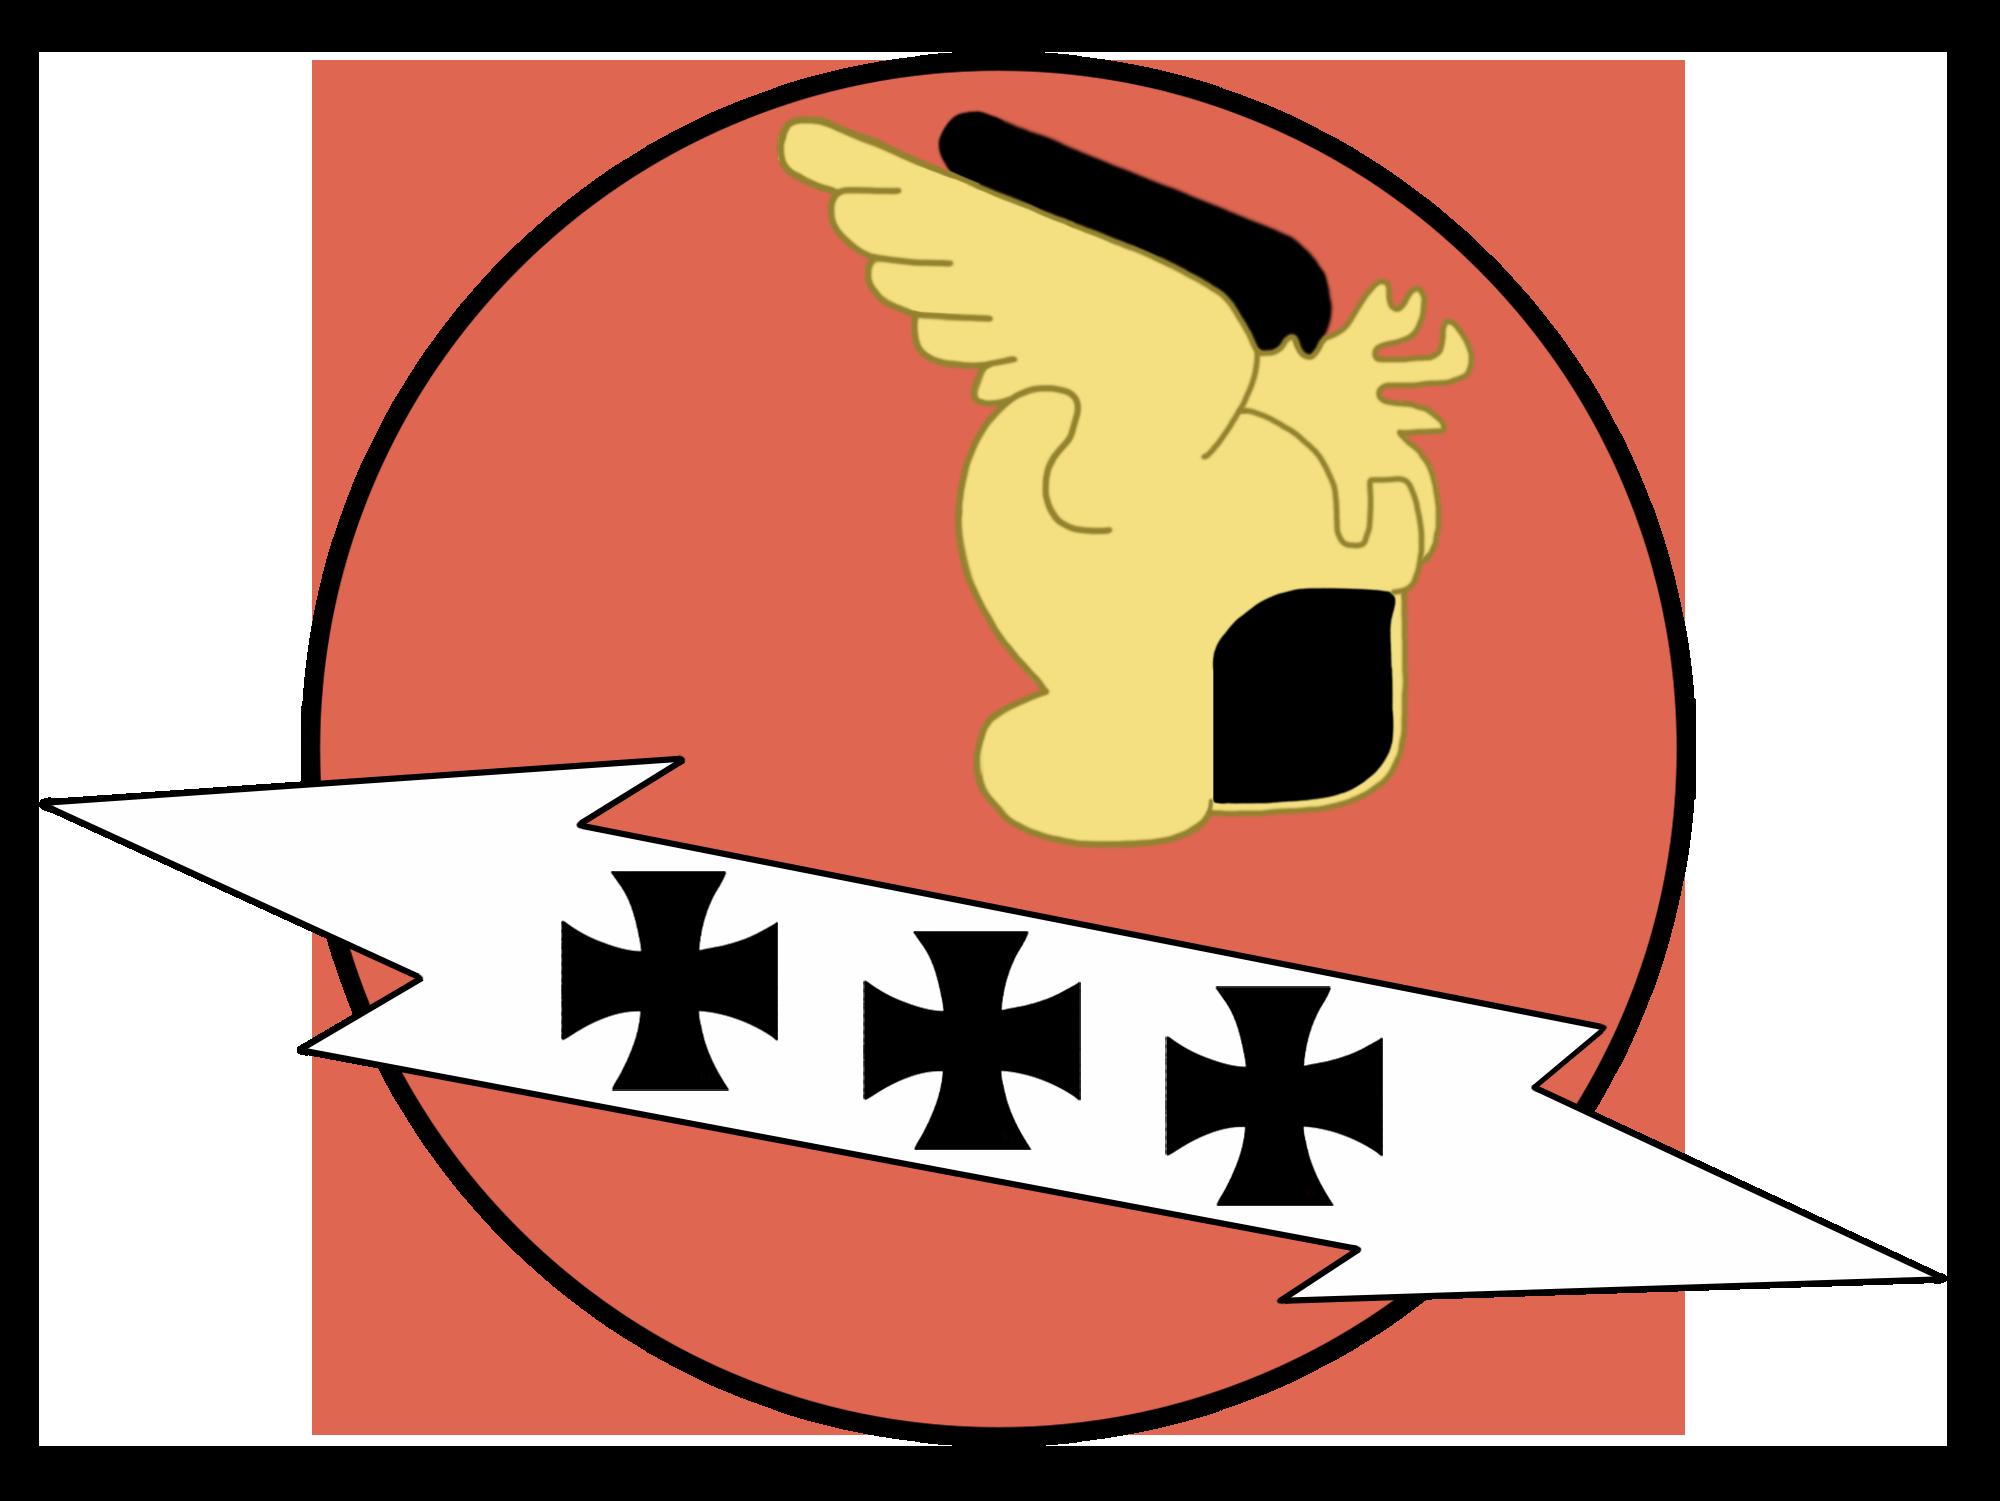 82nd Fighter Squadron Insignia